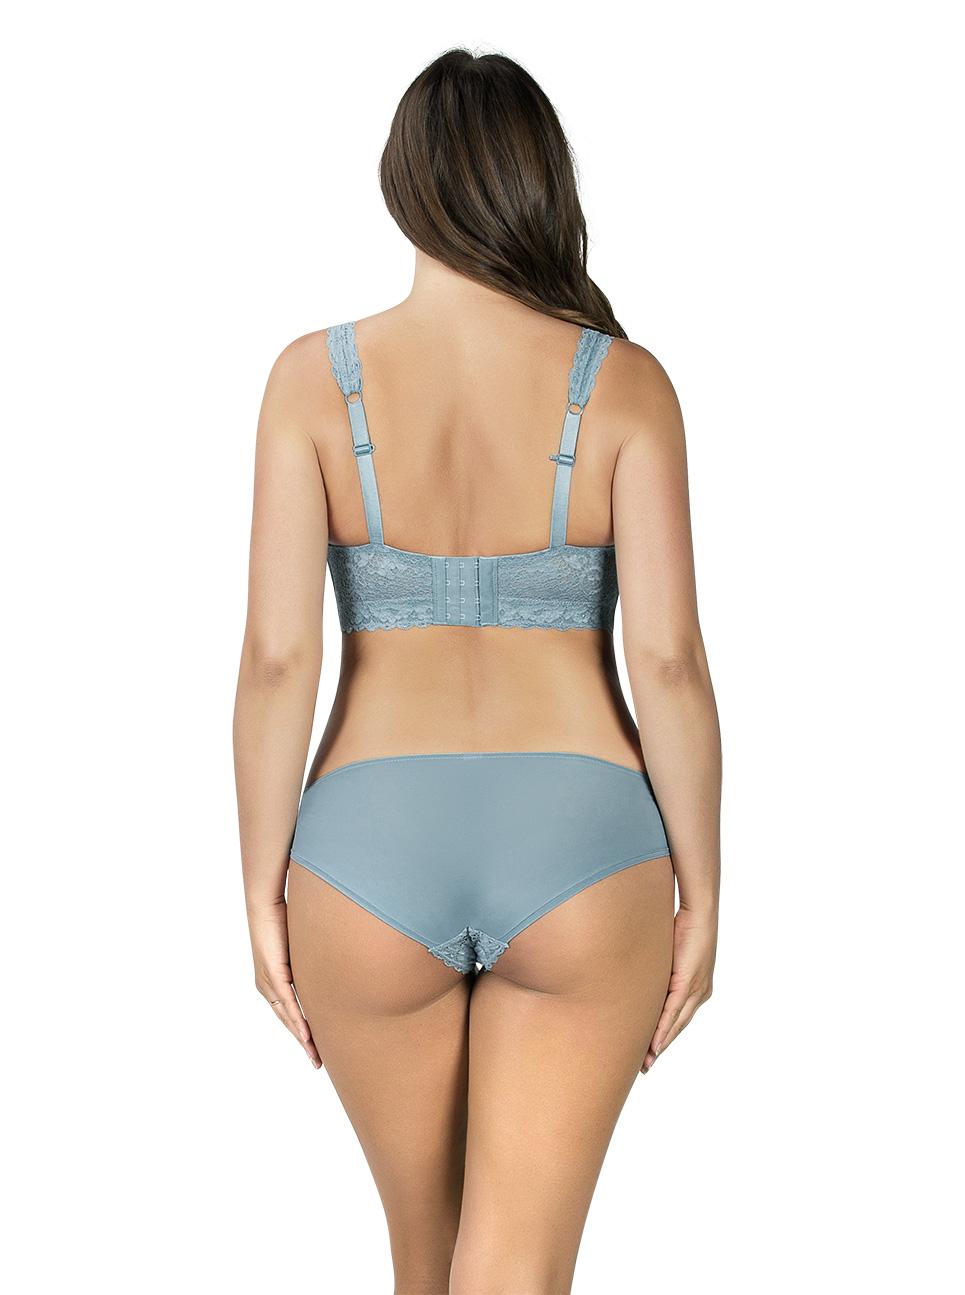 PARFAIT Adriana LaceBraletteP5482 BikiniP5483 StoneBlue Back - Adriana Bikini Stone Blue P5483